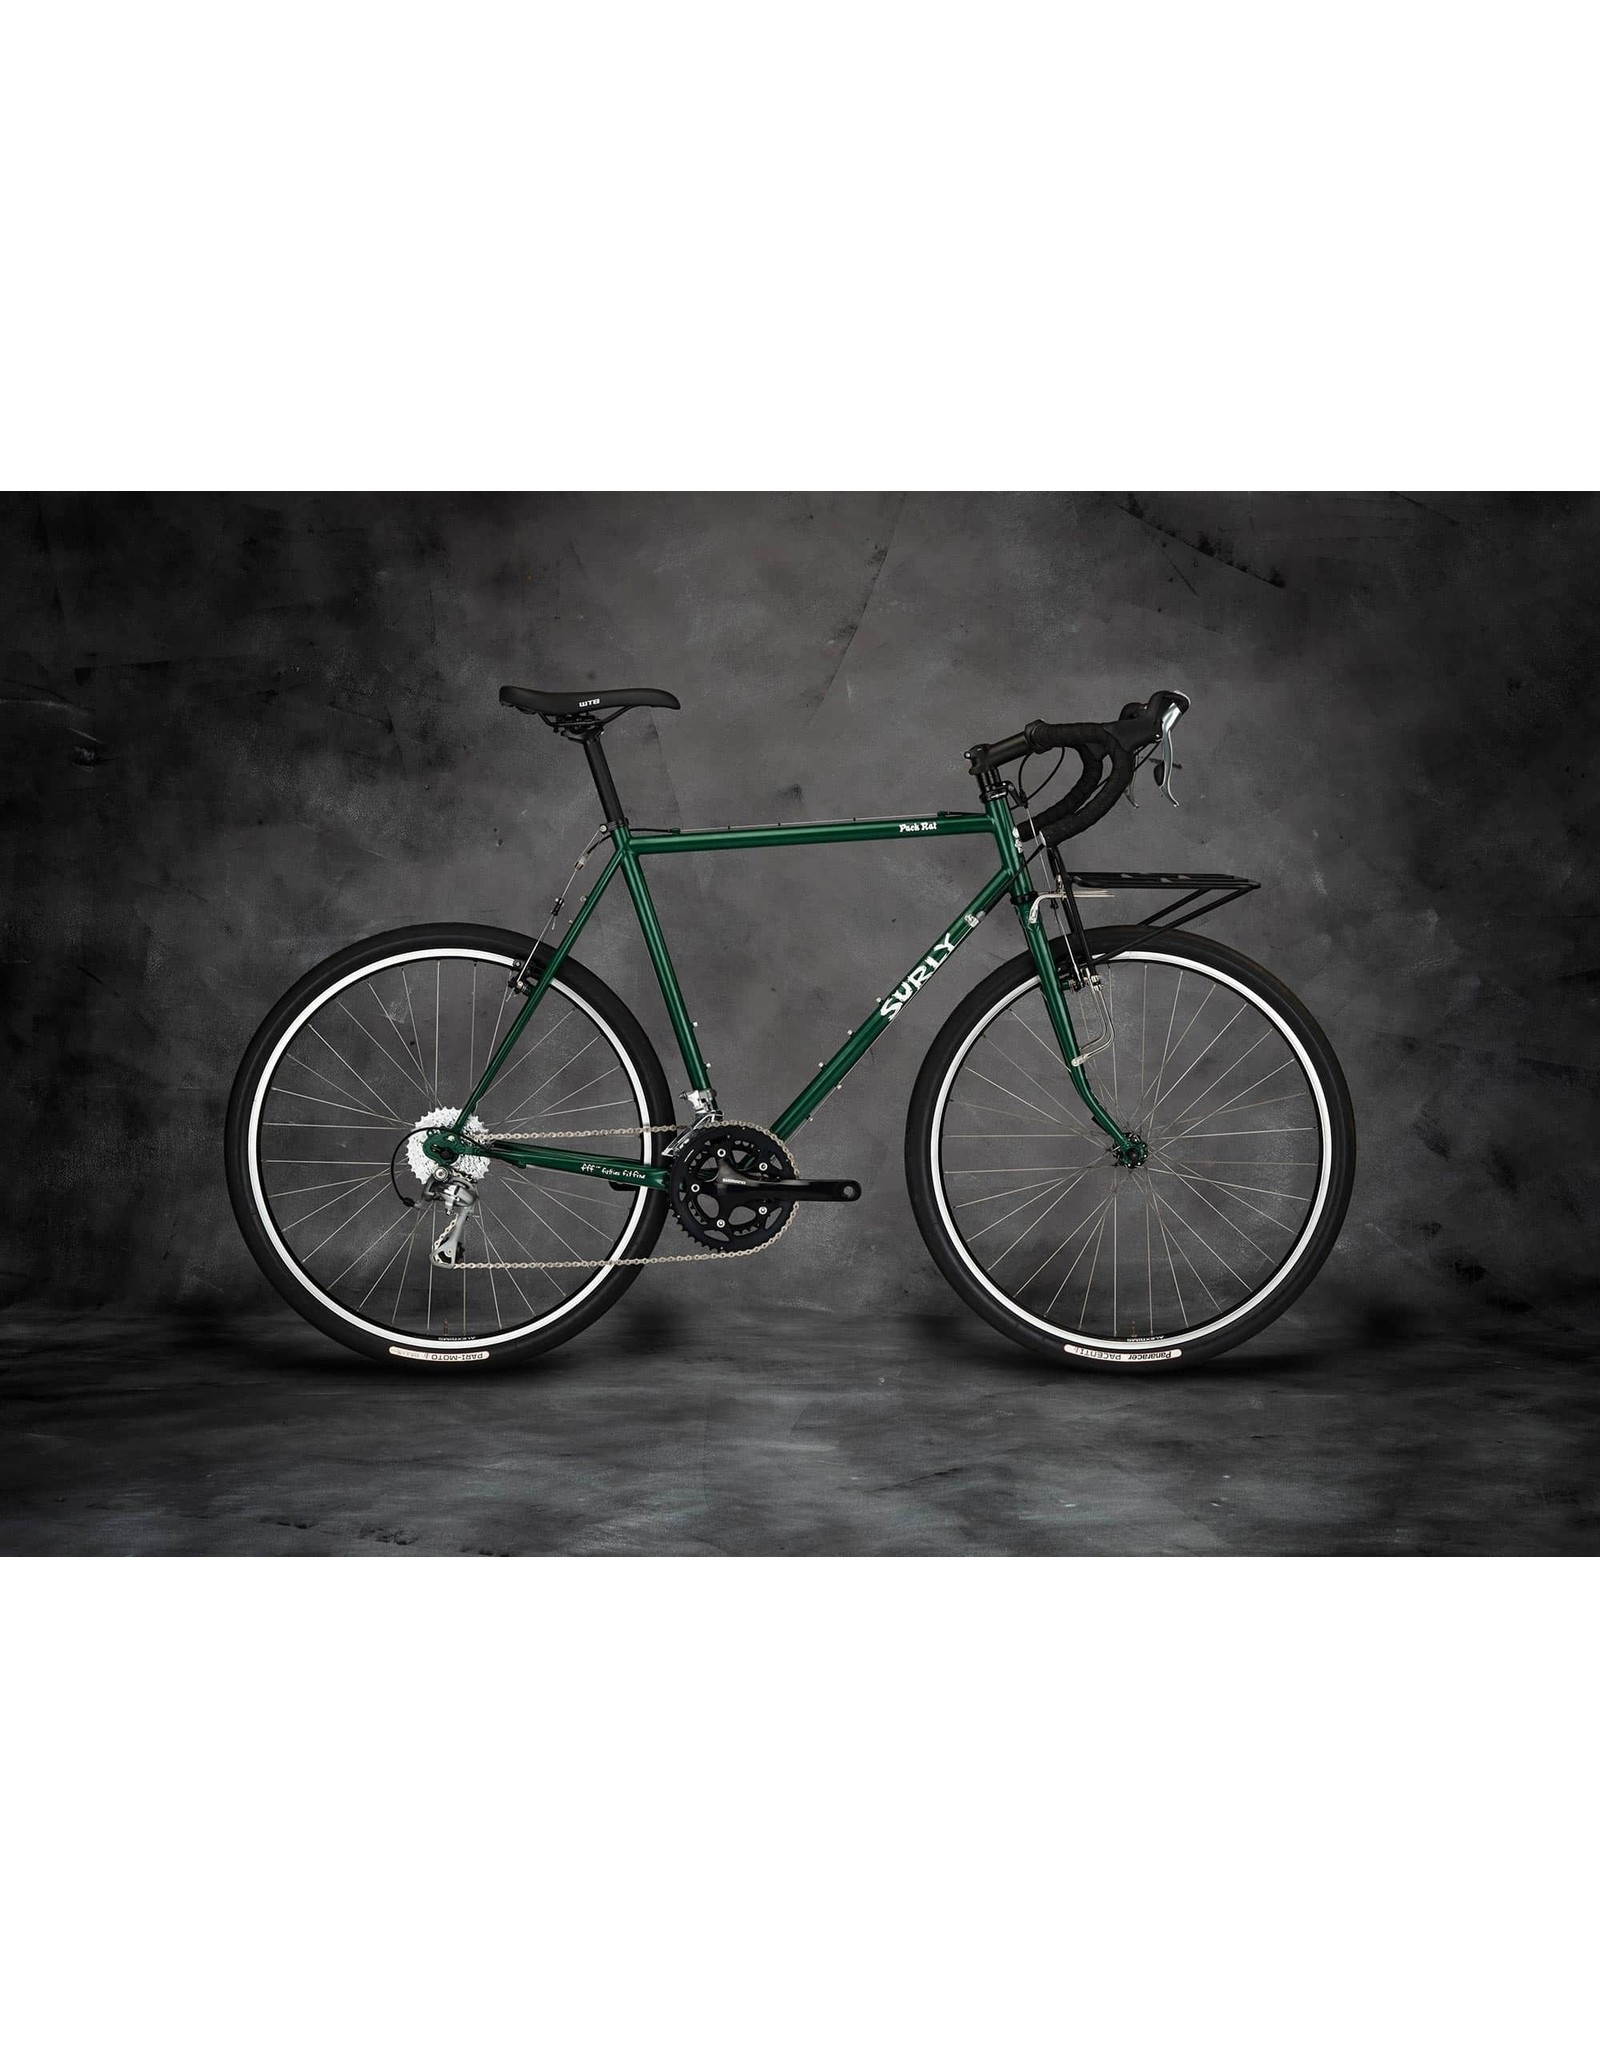 Surly Pack Rat Bike 42cm Get in Green